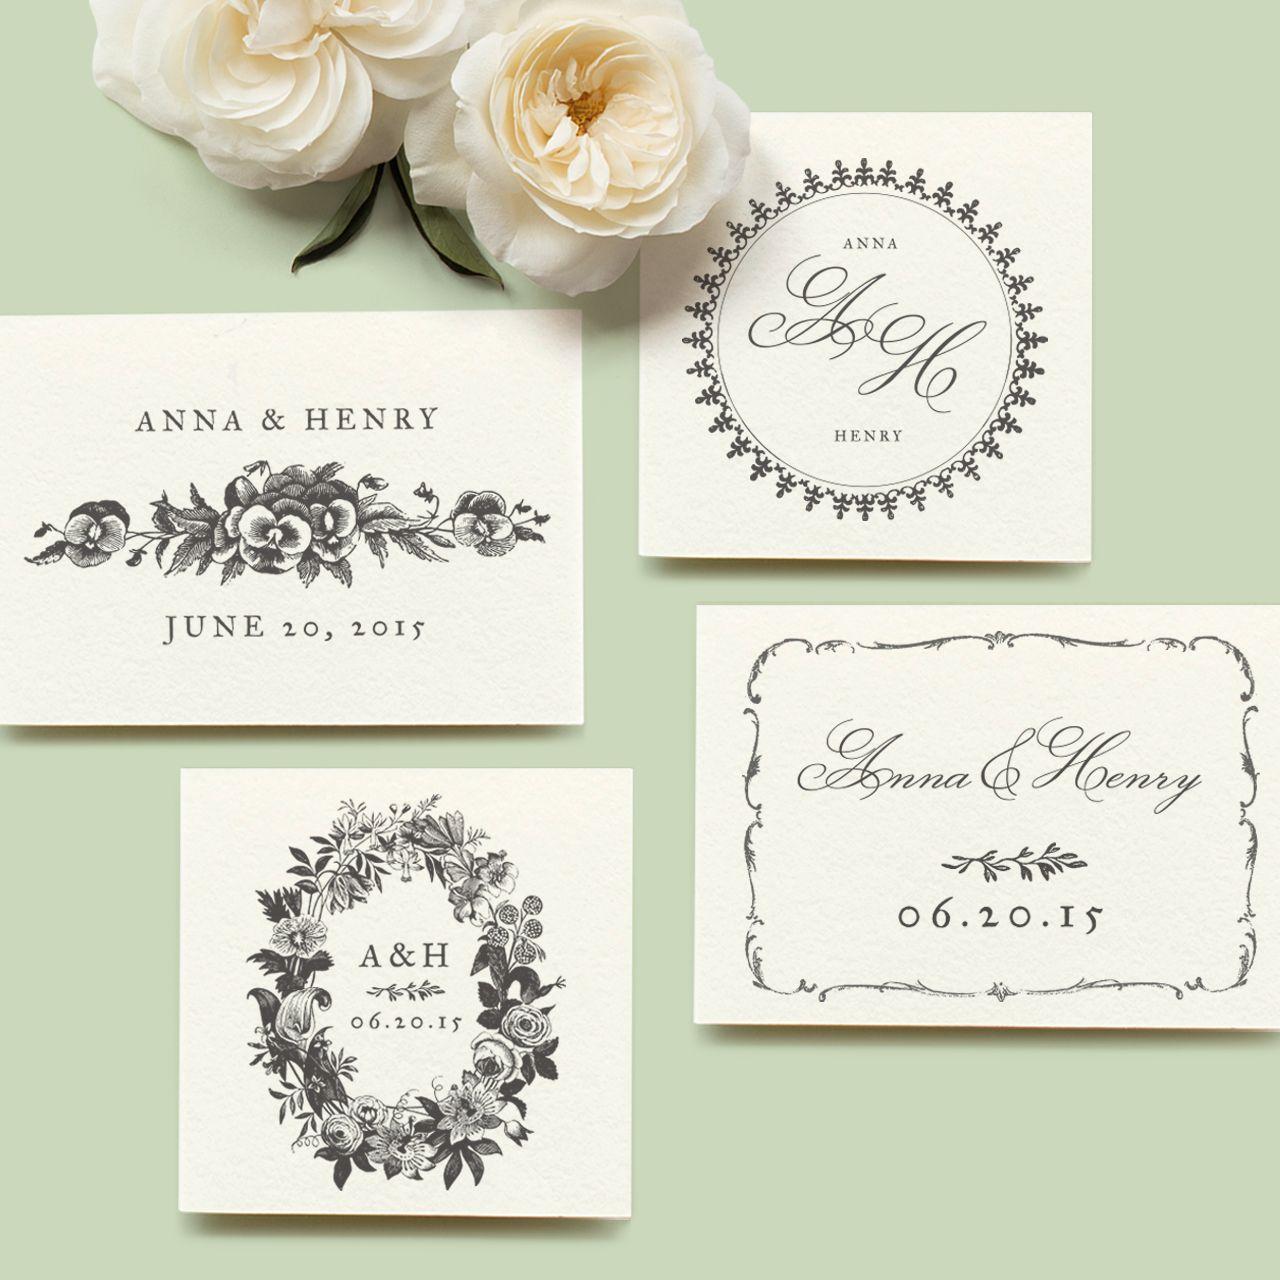 Free customizable classic wedding logos from violetwedding.com. Full ...